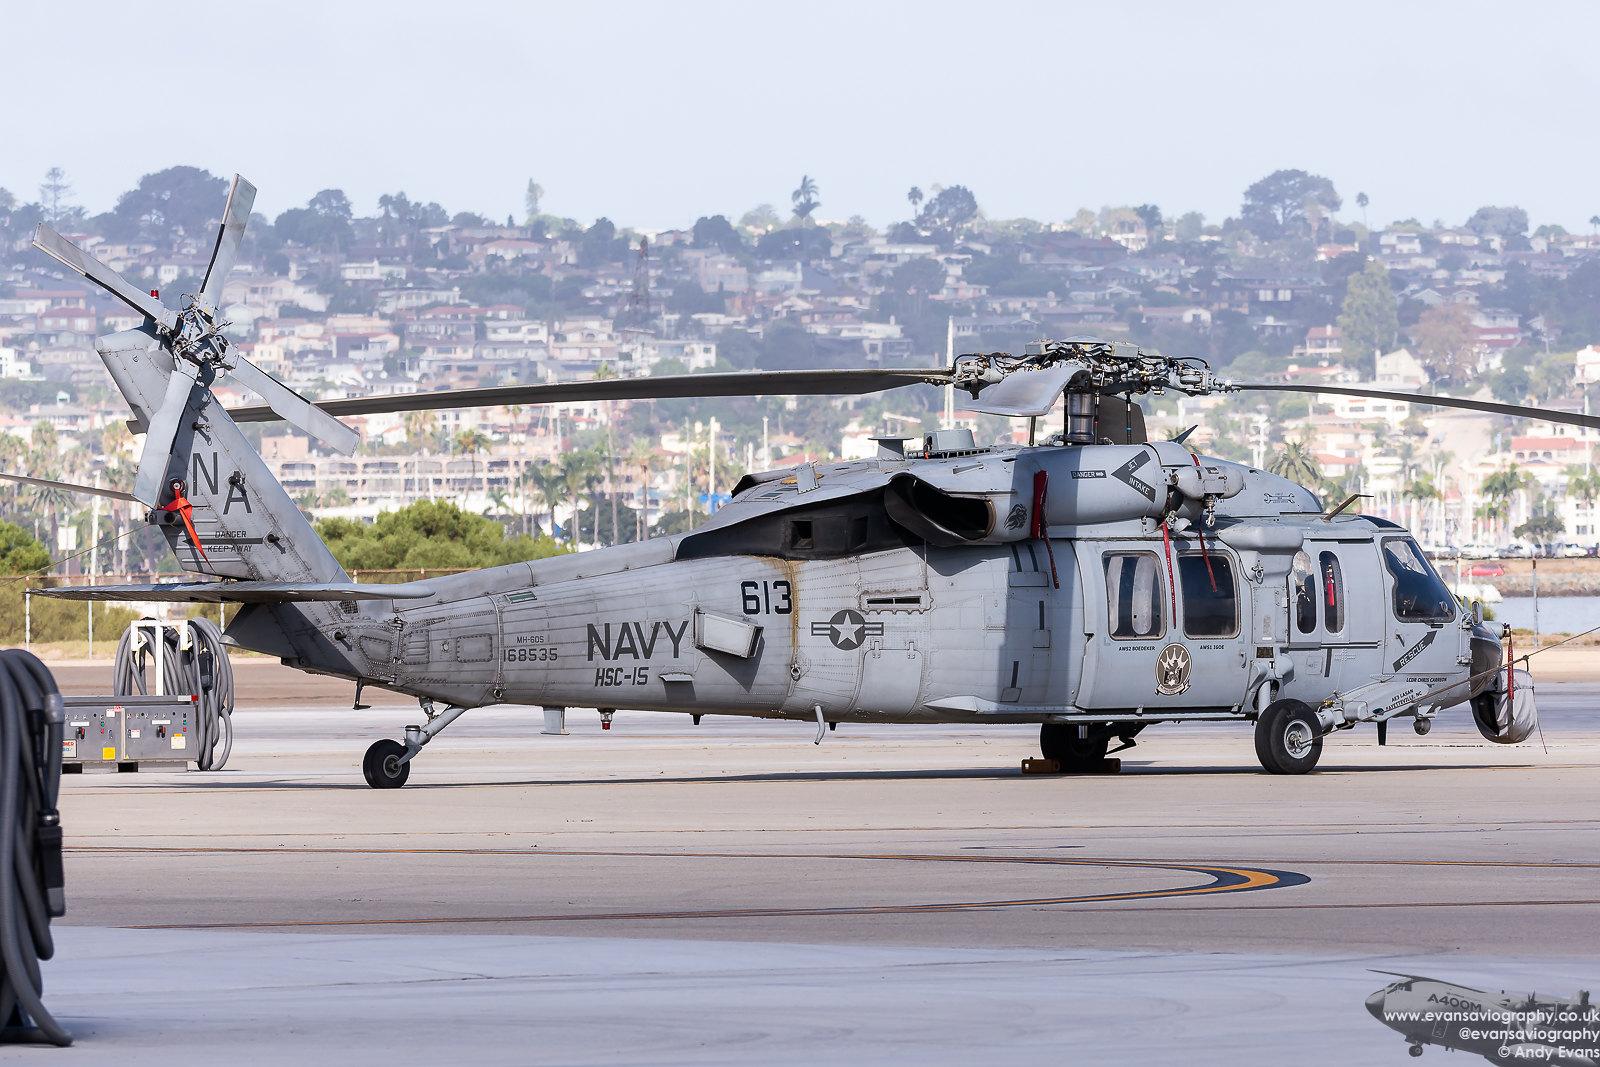 168535 MH-60S HSC-15